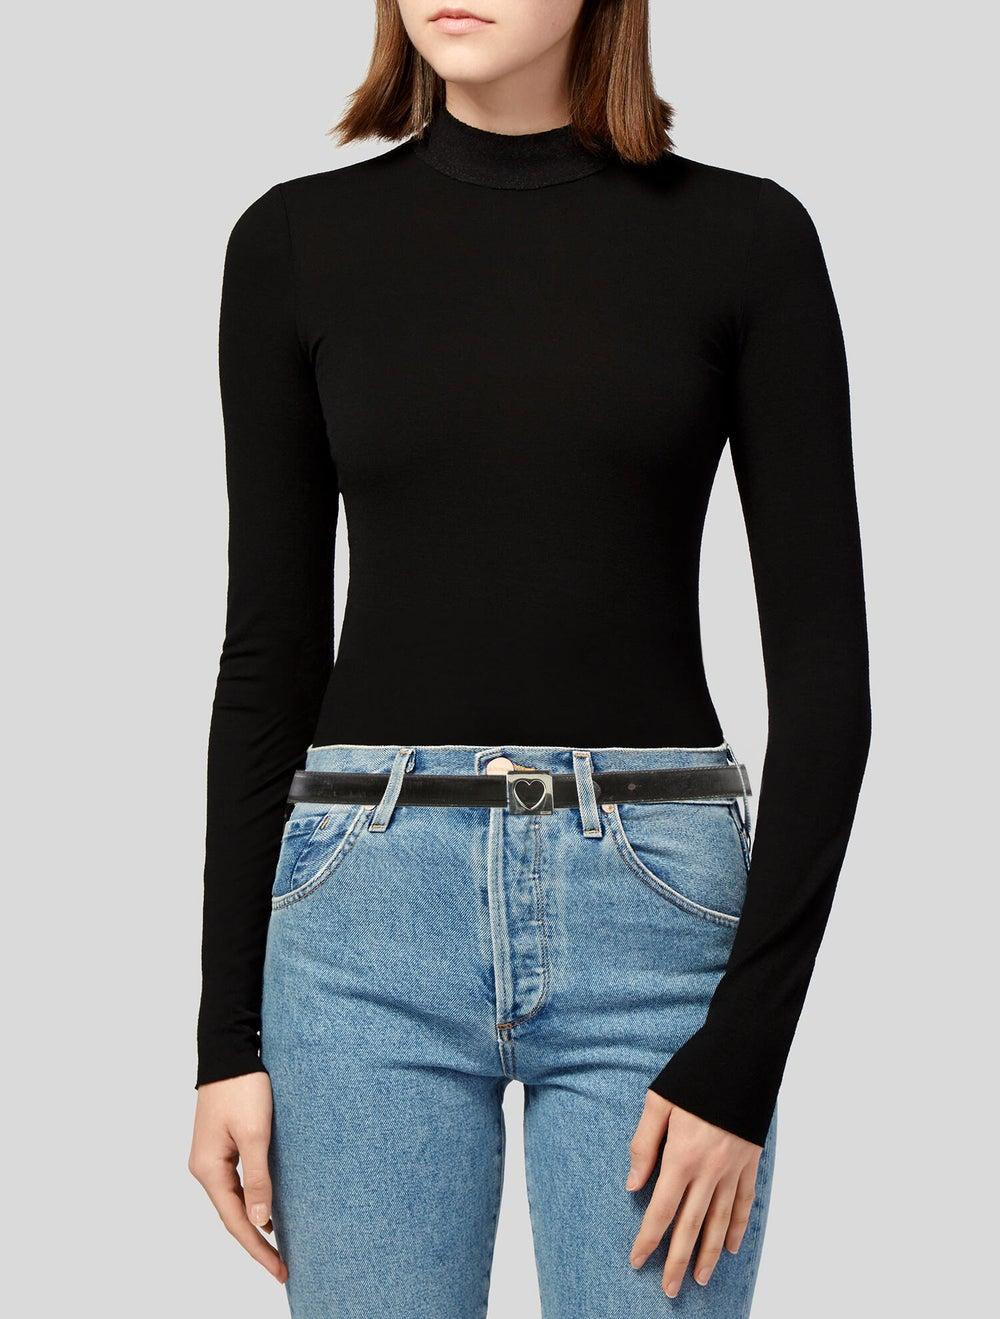 Moschino Leather Hip Belt Black - image 2